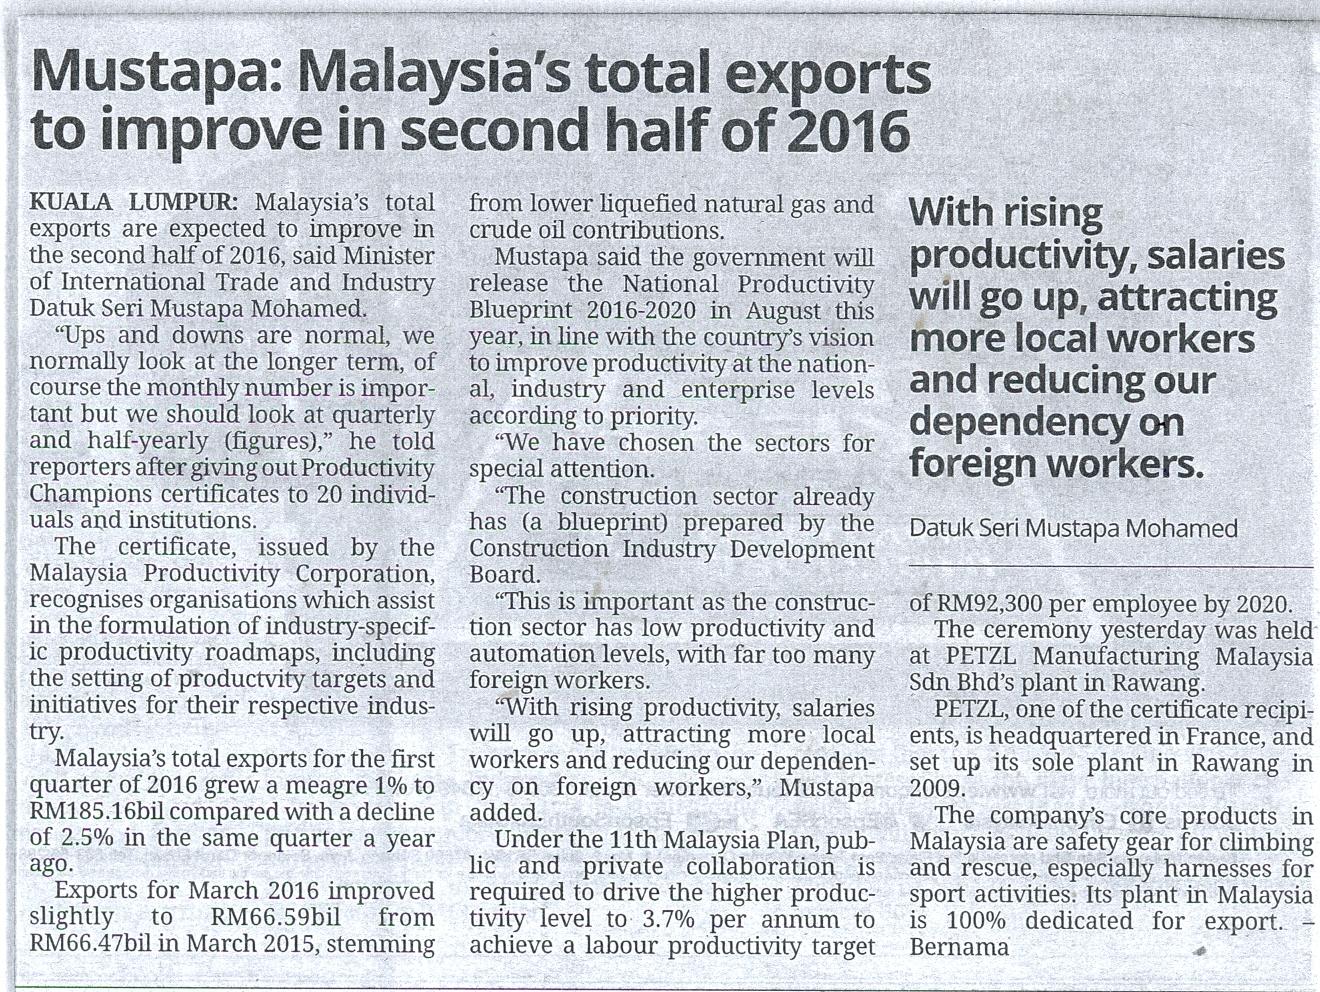 SME Corporation Malaysia - Mustapa:Malaysia's total exports